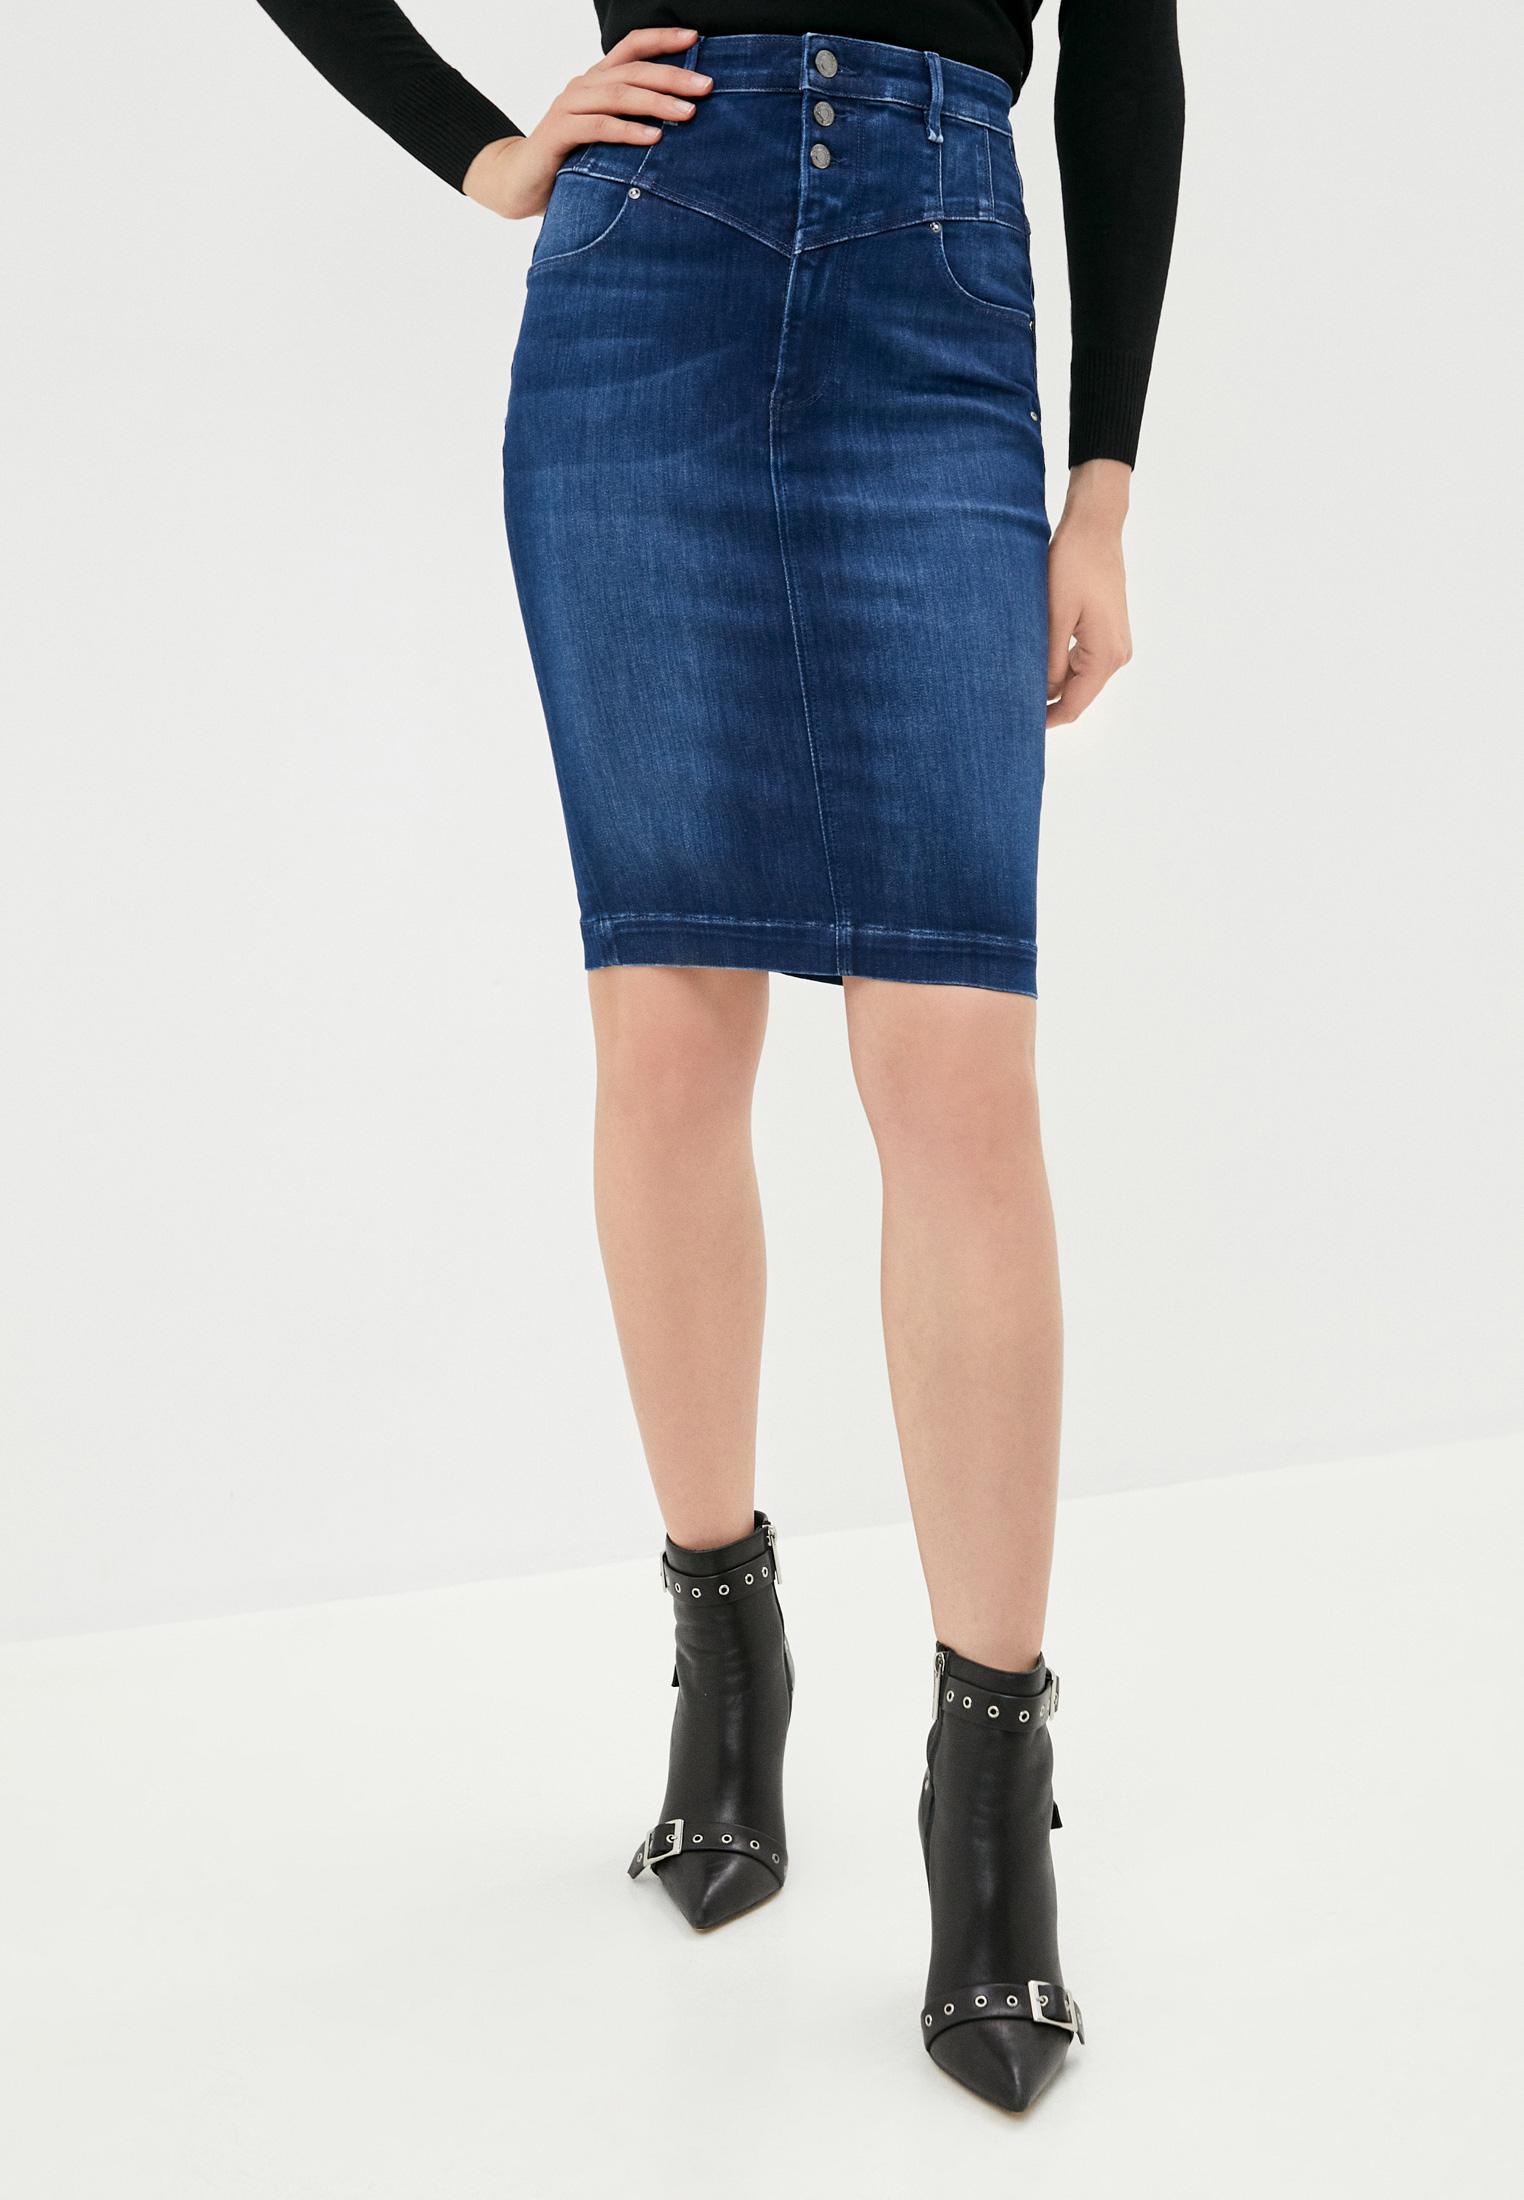 Джинсовая юбка Guess Jeans W0YD65 D42J1